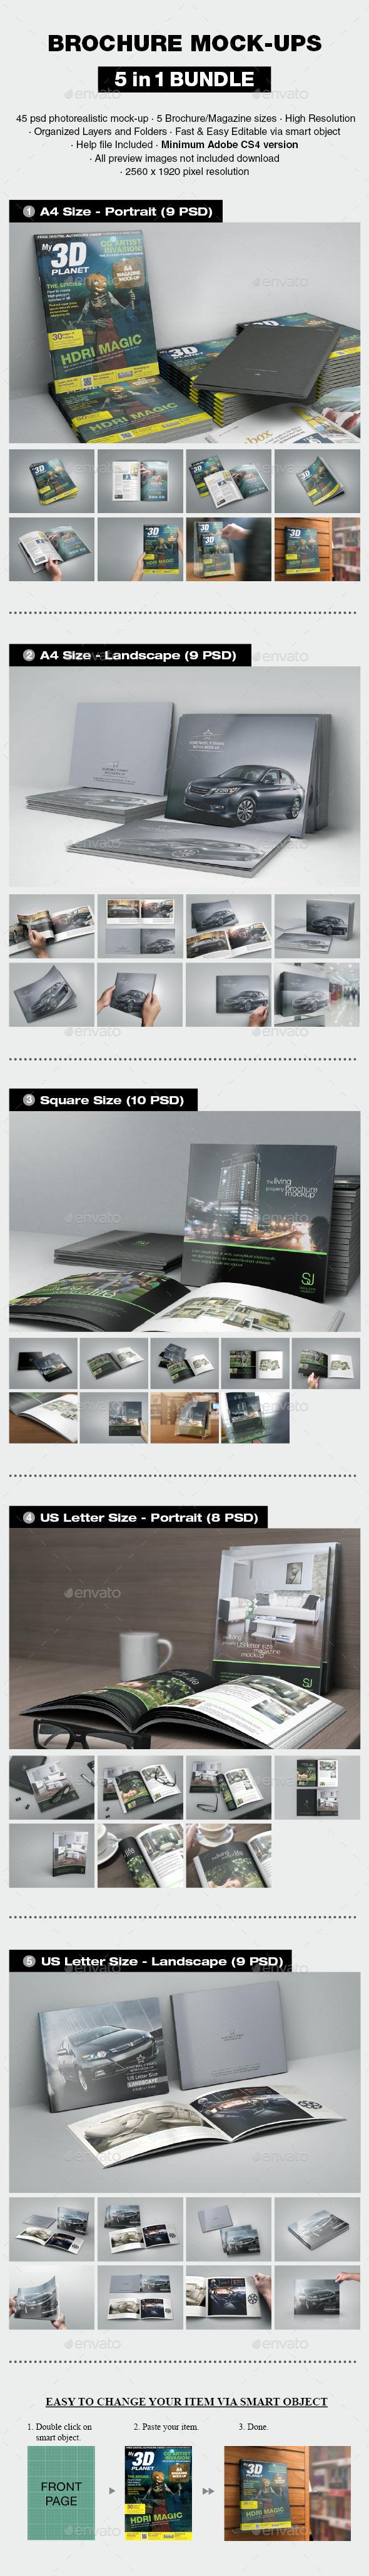 Brochure Mock-up Bundle - Print Product Mock-Ups